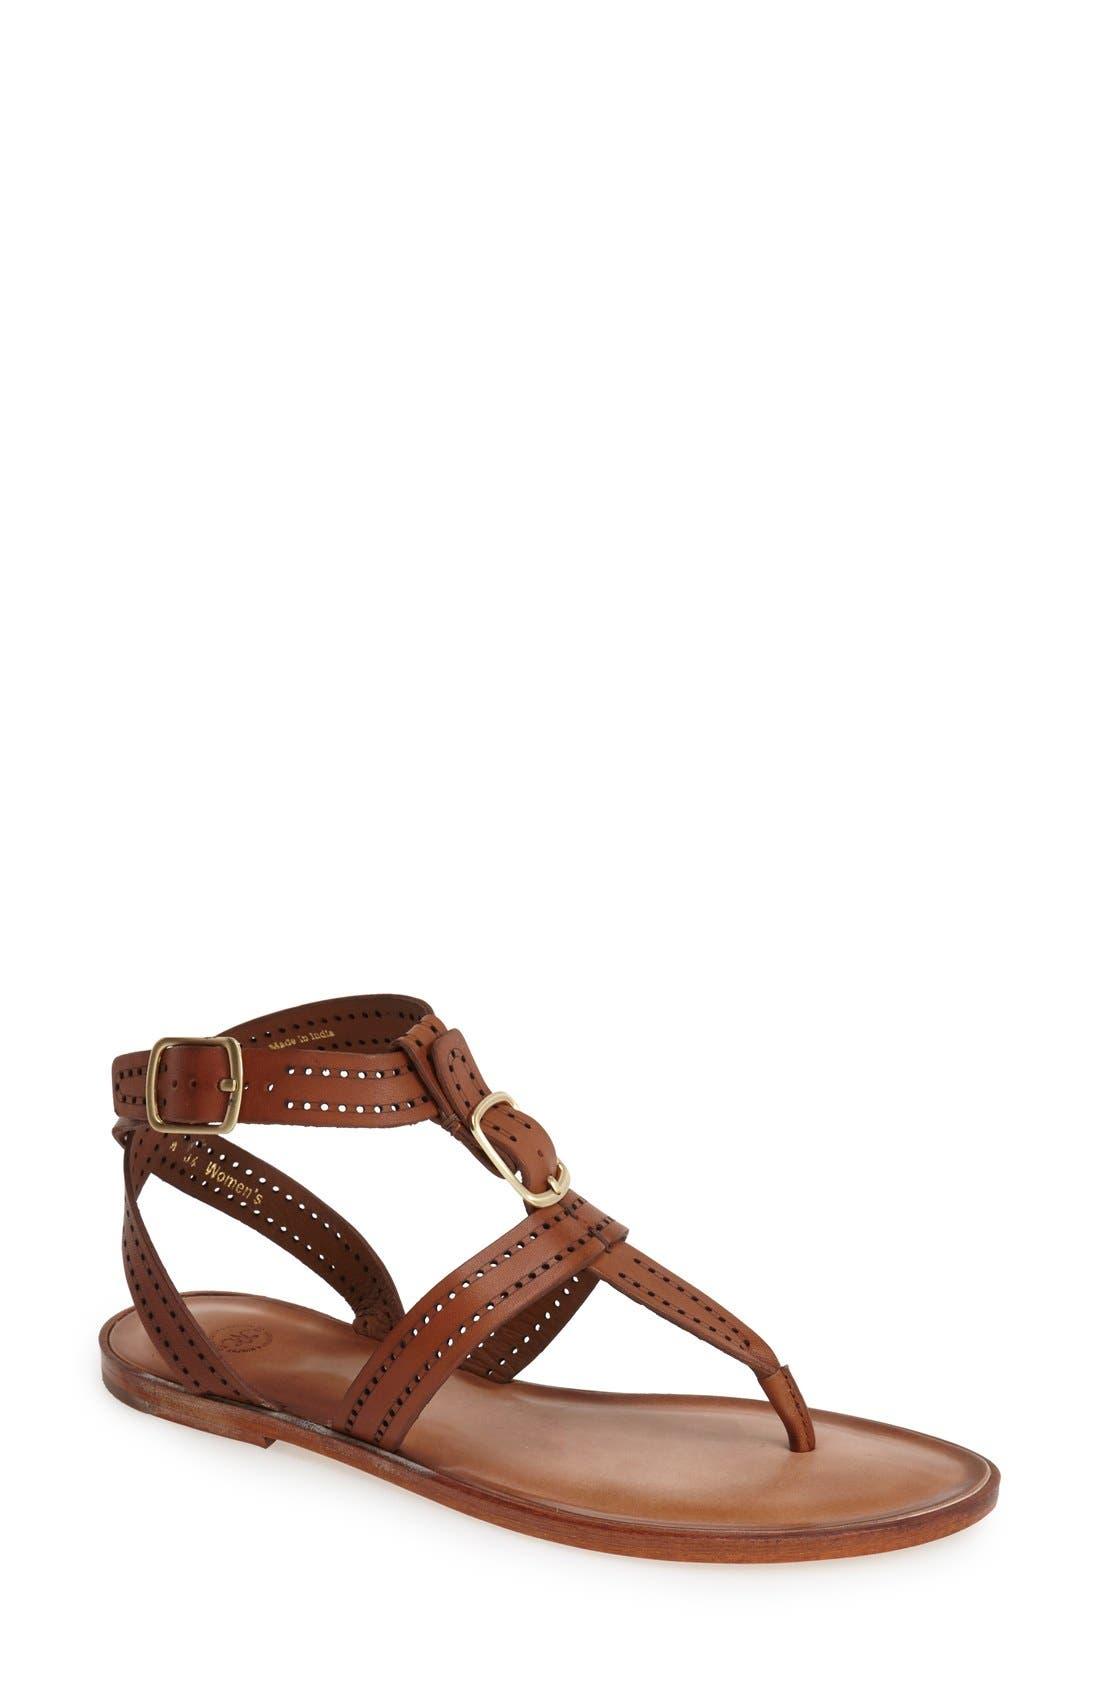 Main Image - Johnston & Murphy 'Patti' Perforated Leather Thong Sandal (Women)